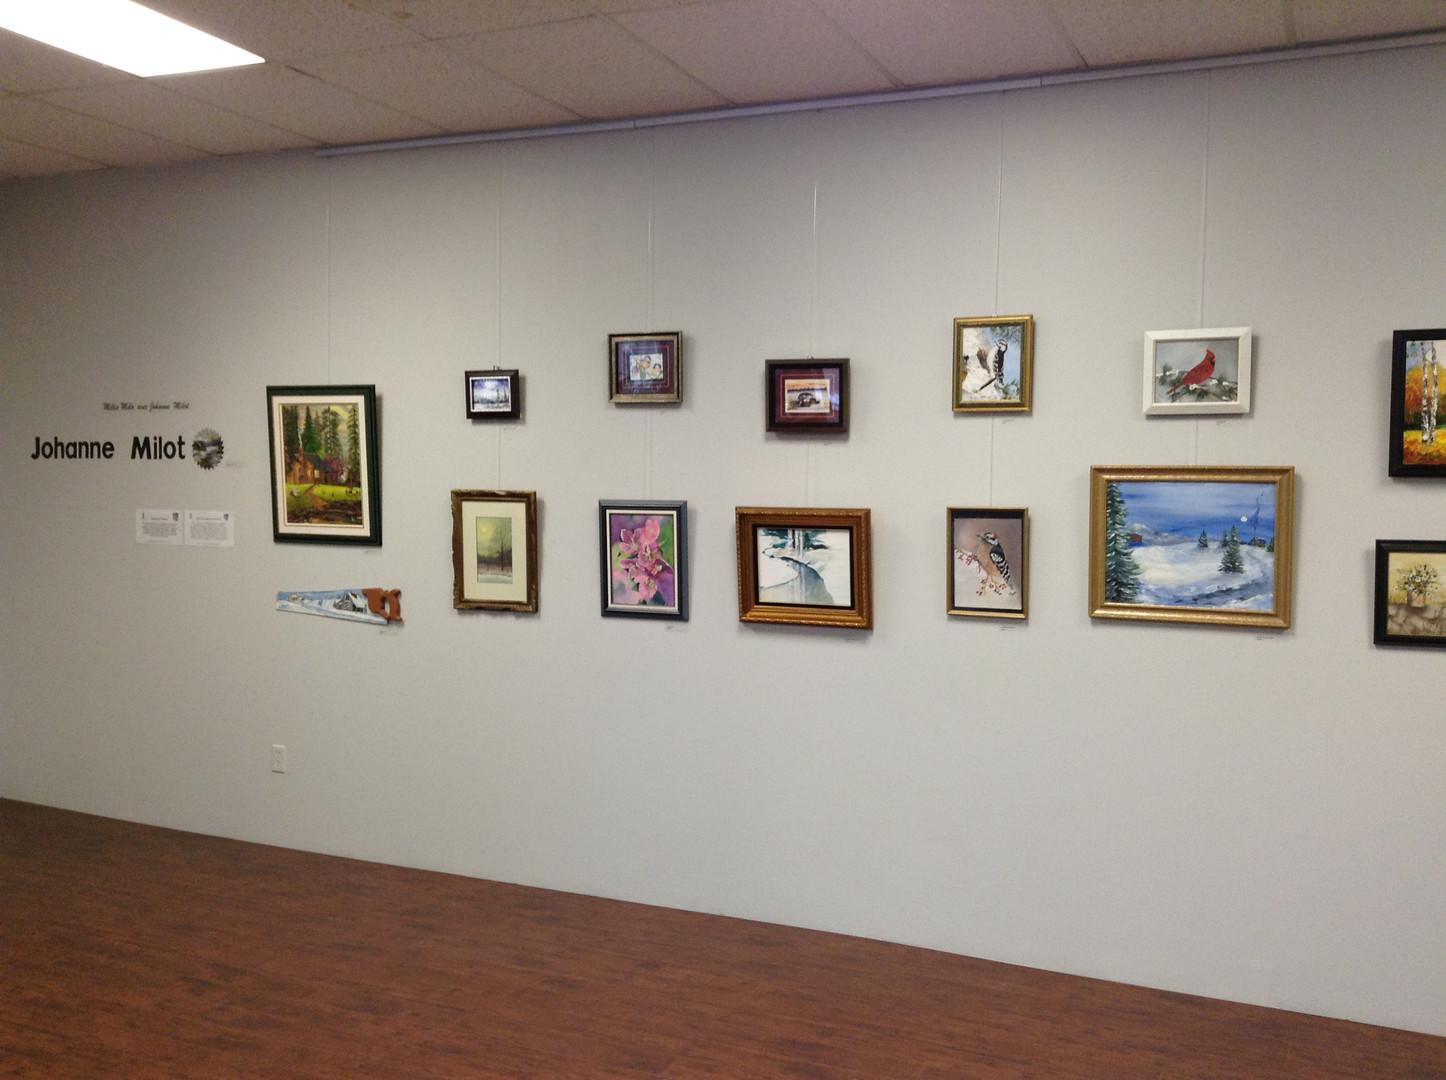 OSL Community Gallery Wall//Mur de la galerie communautaire de l'OSL